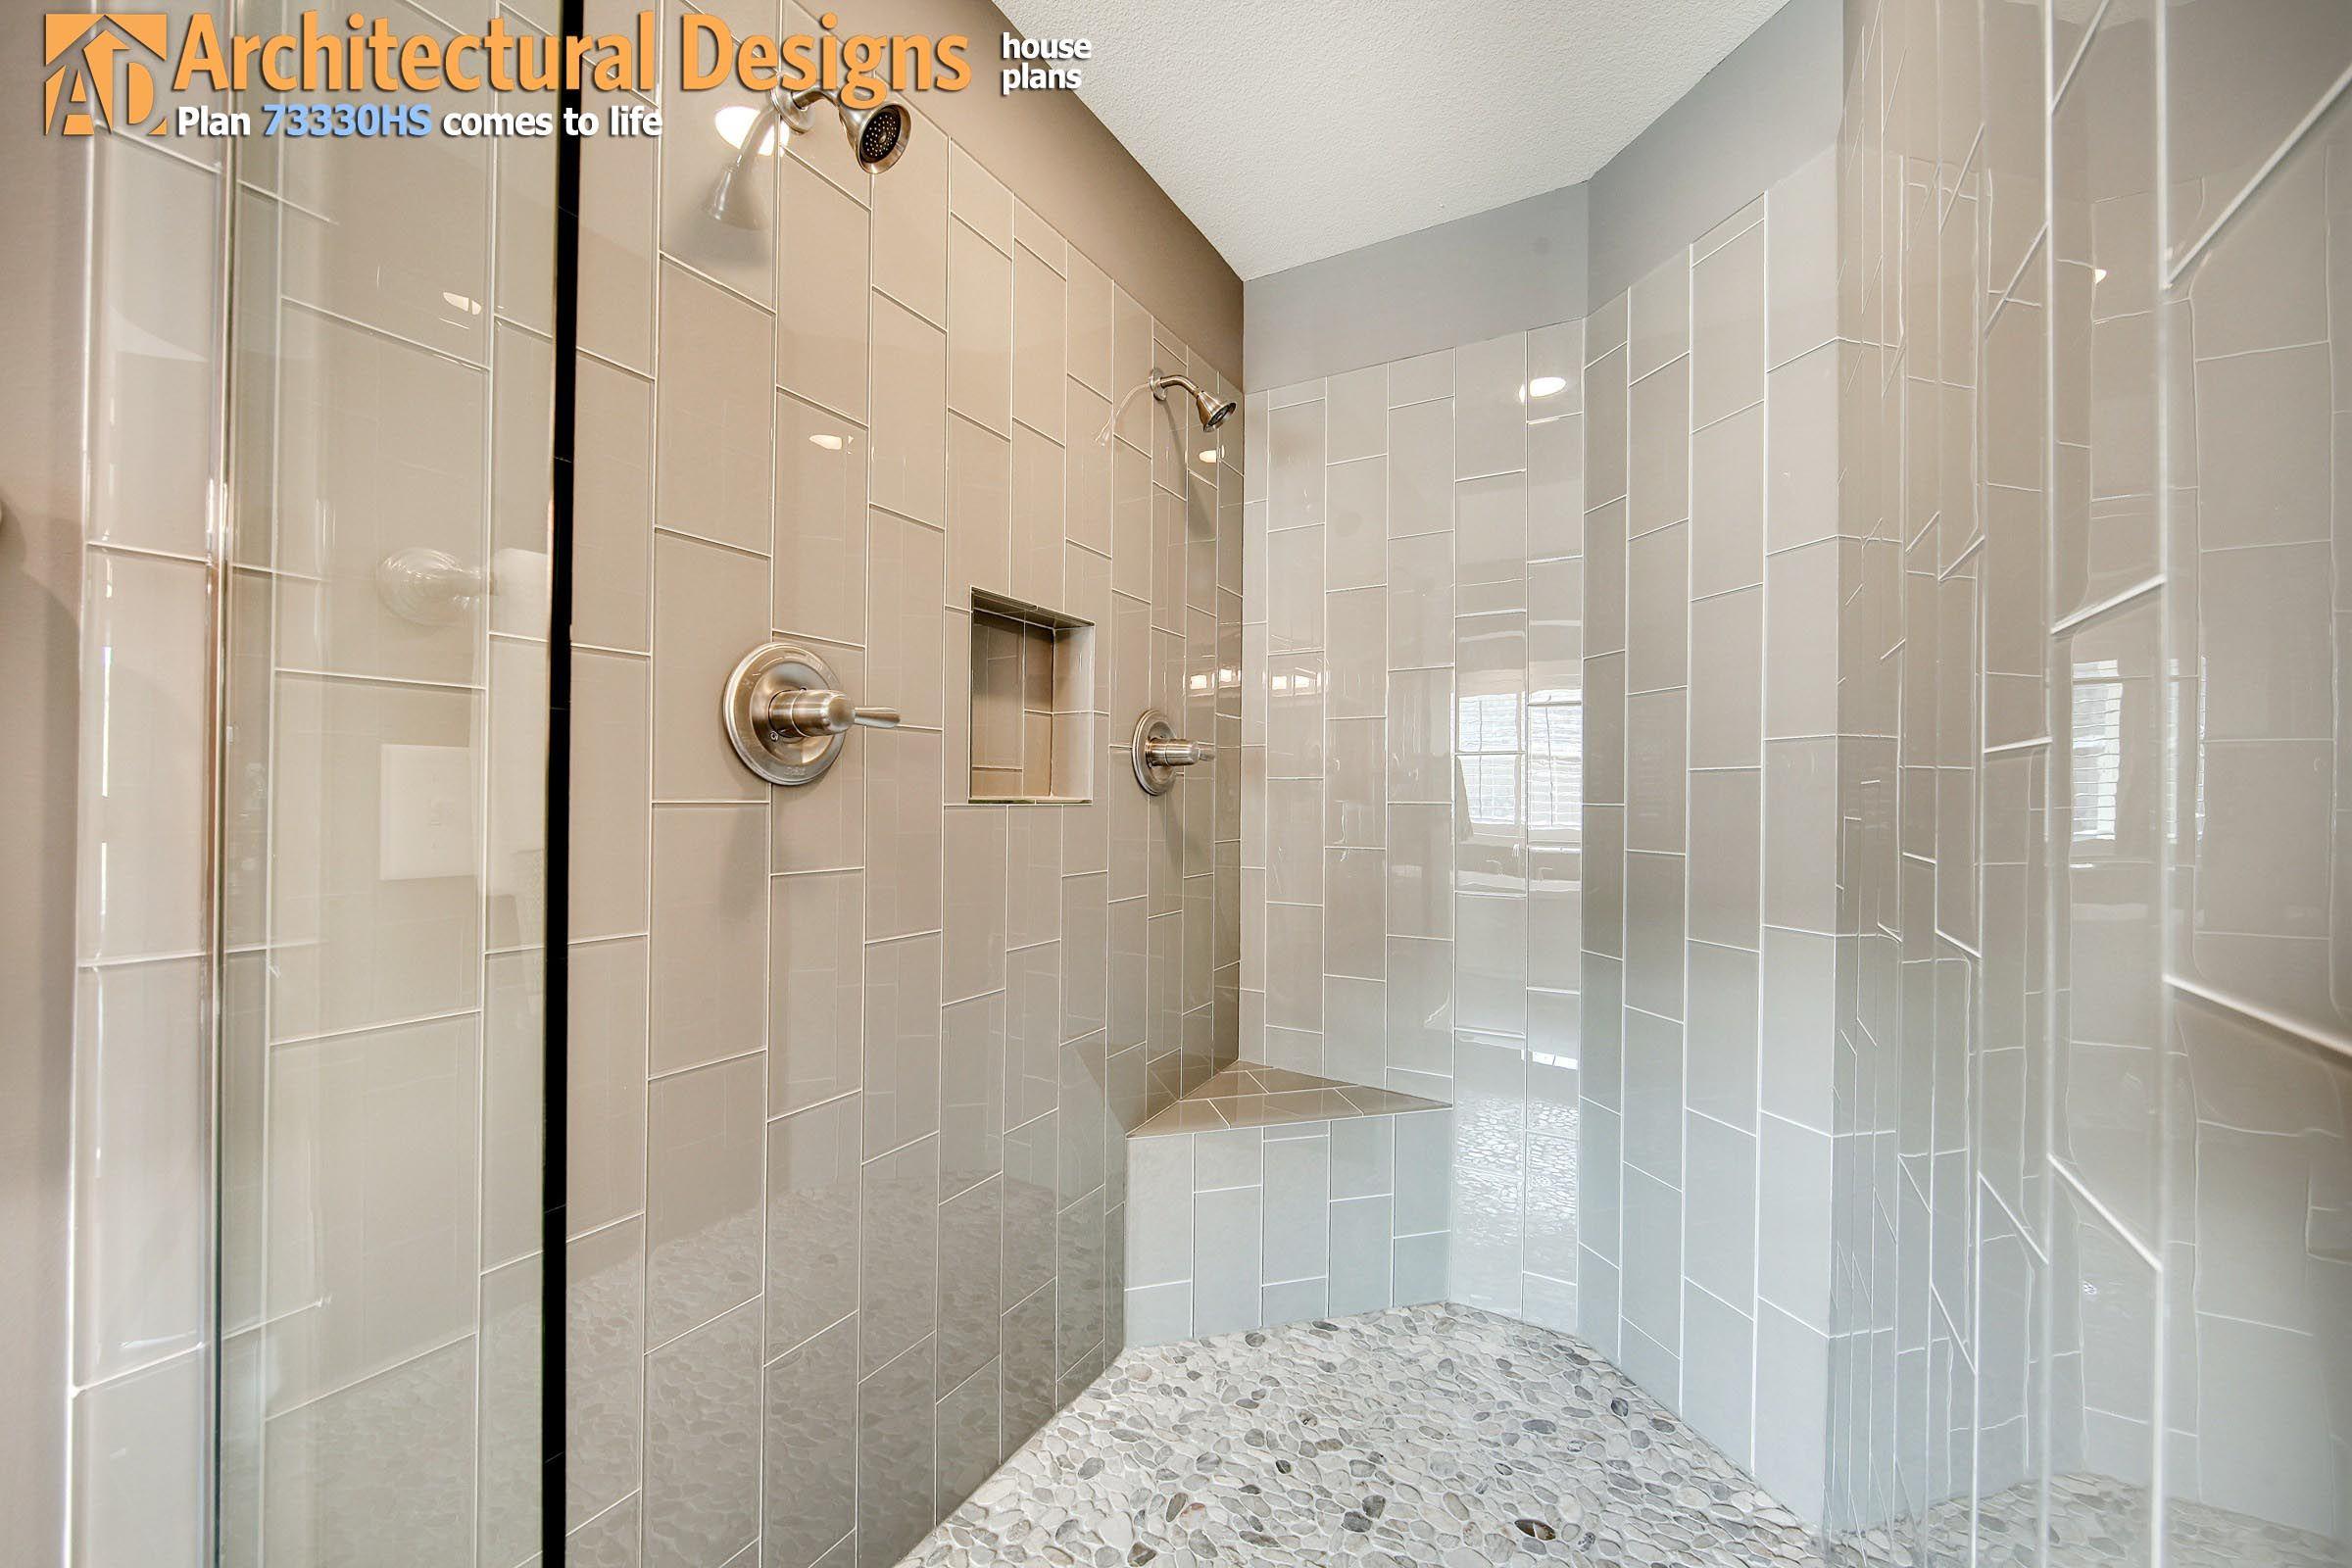 Exclusive house plan 73330hs master bath house plan link for Architecturaldesigns com house plan 56364sm asp